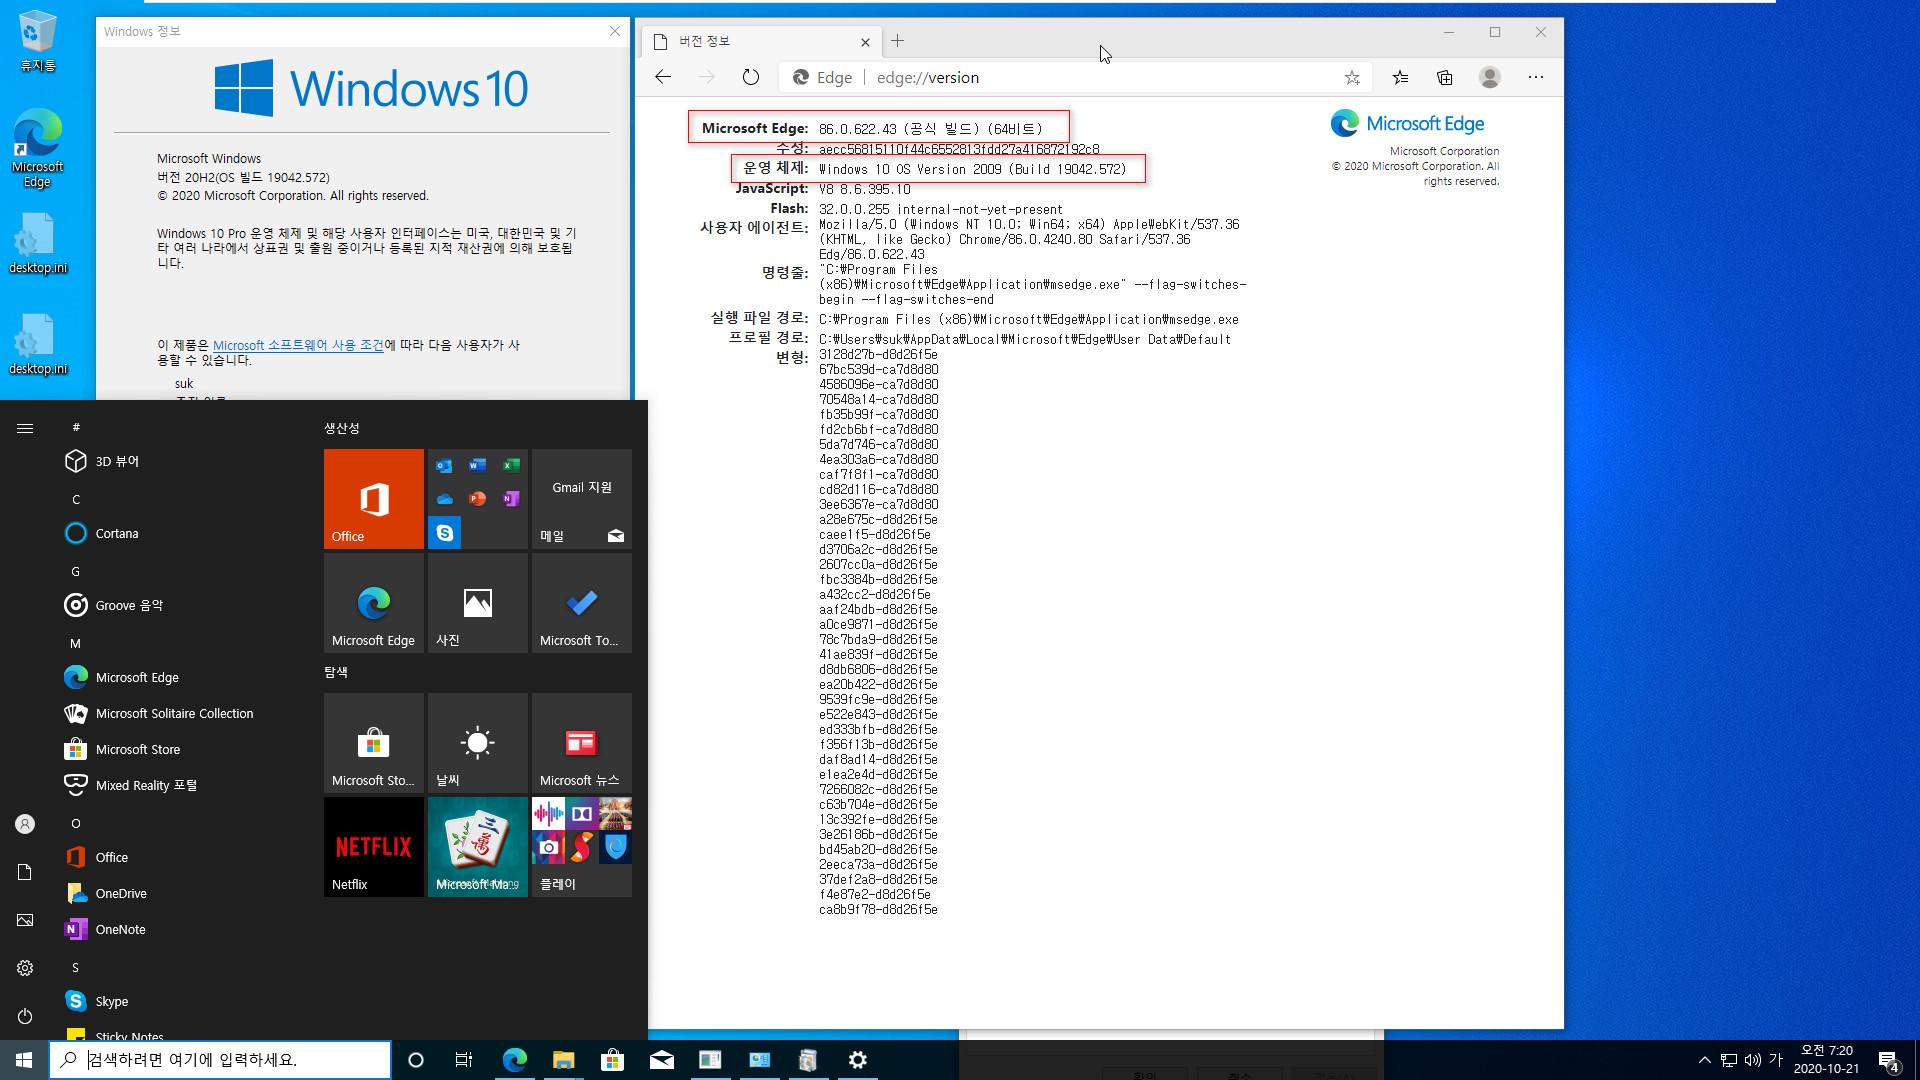 Windows 10 버전 2009 (20H2) 정식 출시되었네요 - MSDN은 19042.508 빌드 9월 정기 업데이트인데, ms 홈페이지는 19042.572 빌드 10월 정기 업데이트네요 - 다운로드하고 윈도우 설치하여 확인해봅니다 2020-10-21_072037.jpg